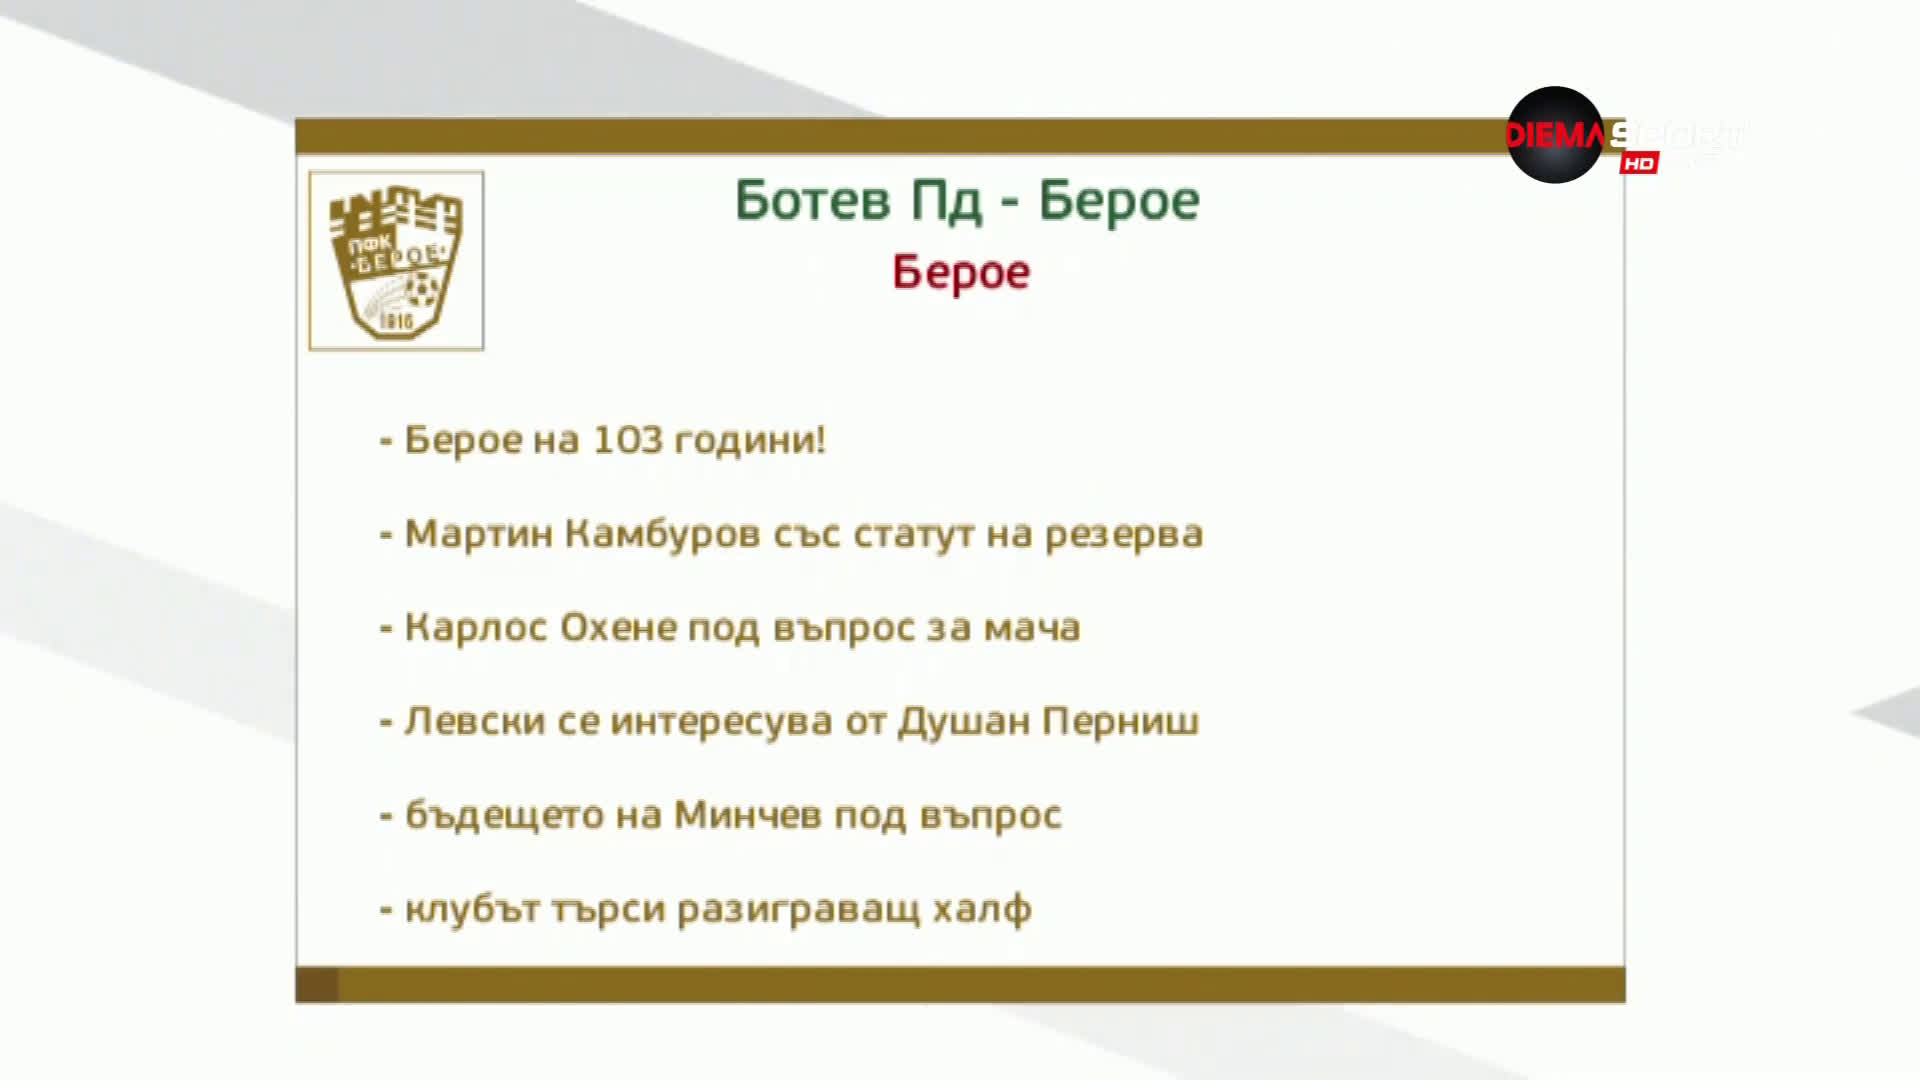 Преди Берое - Ботев